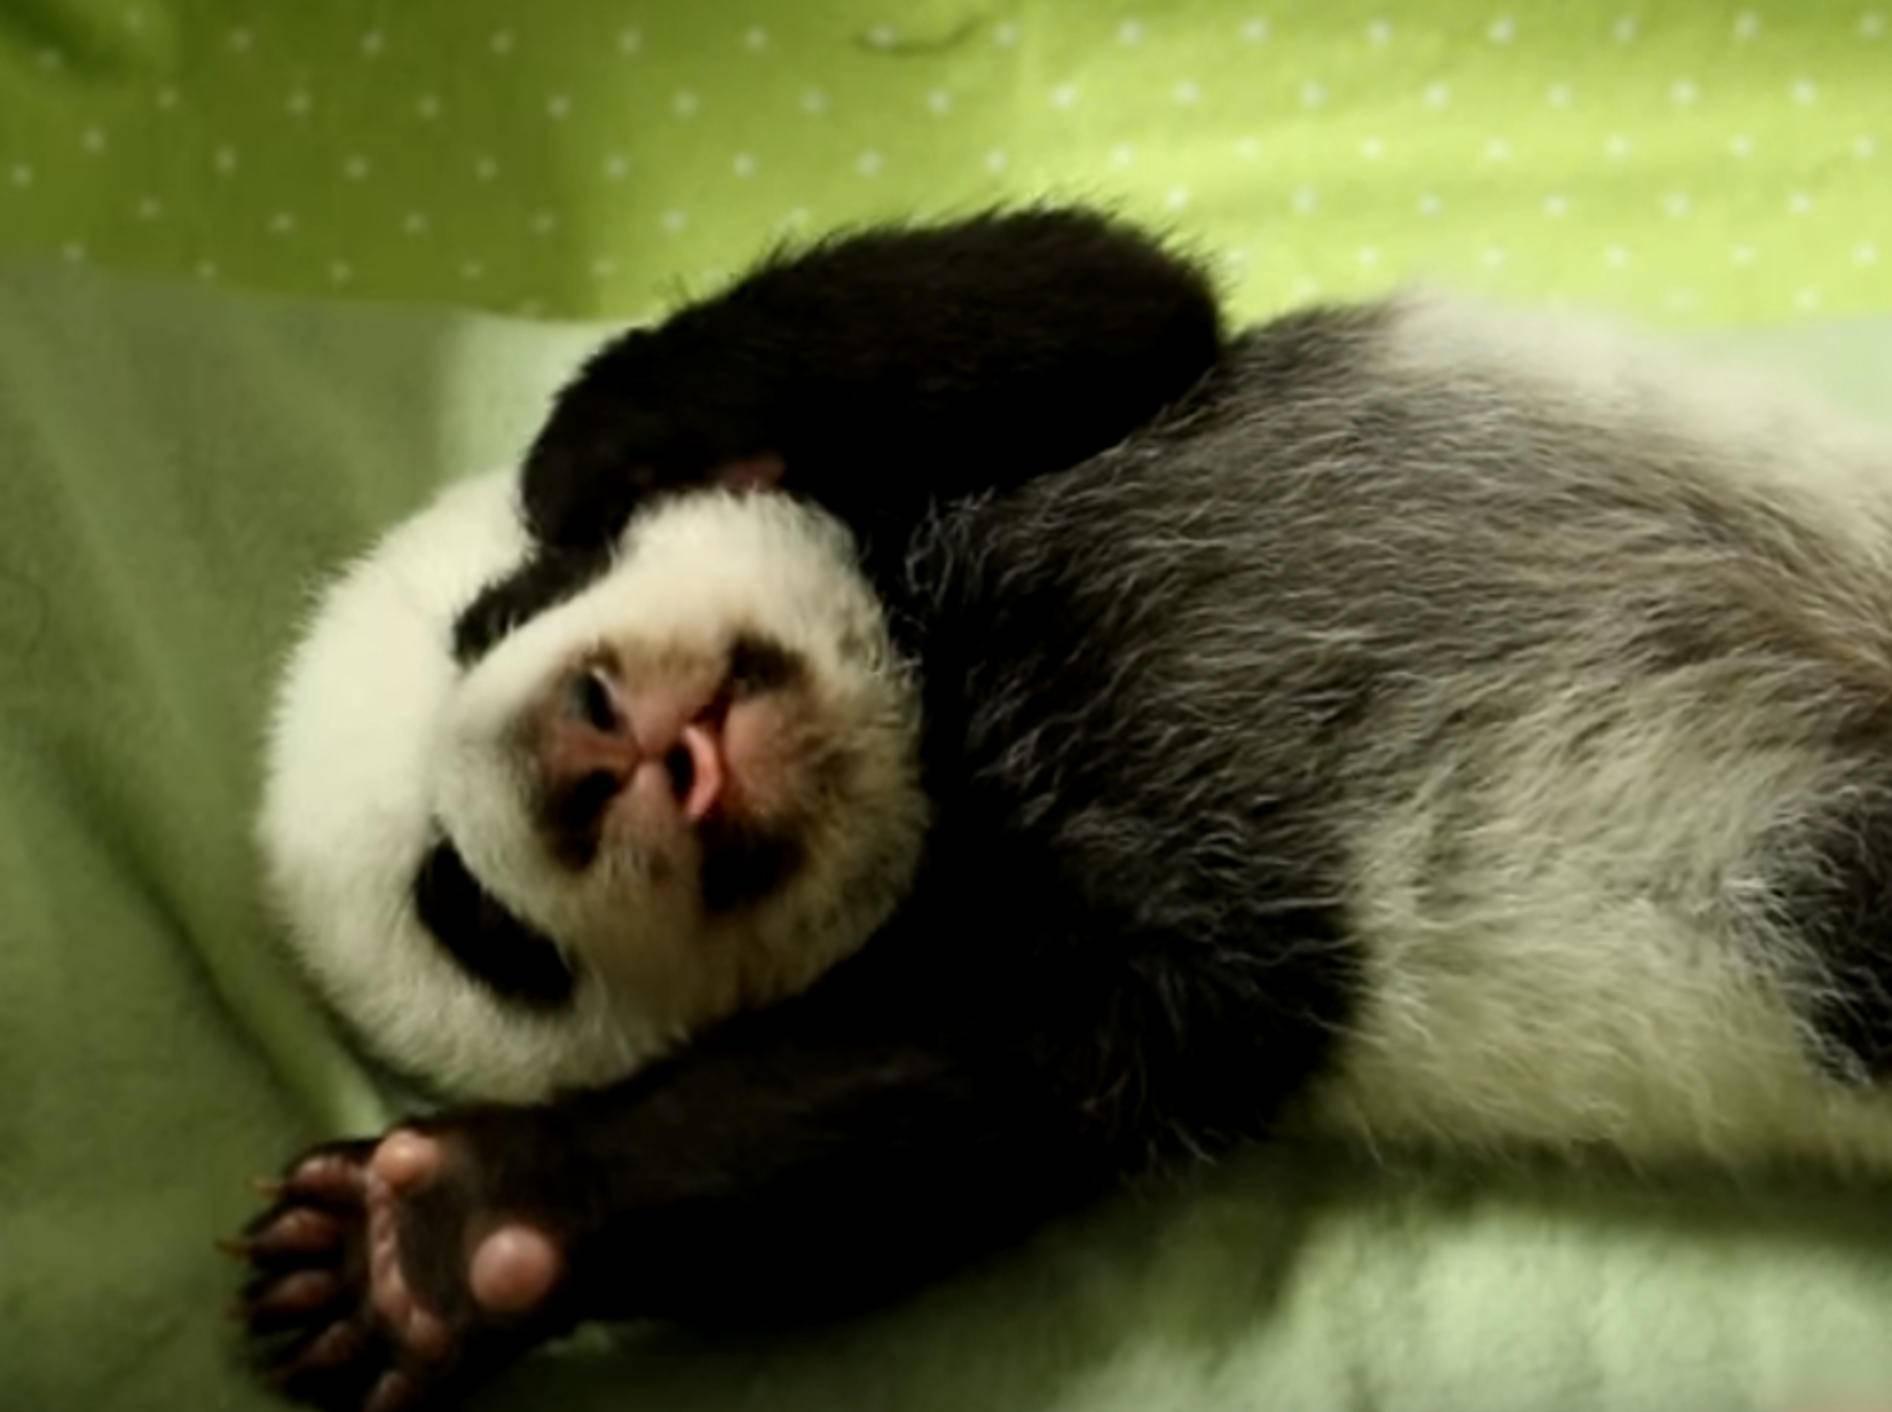 Herziges Panda-Baby im Toronto Zoo öffnet erstmals die Äuglein – Bild: YouTube / Toronto Zoo